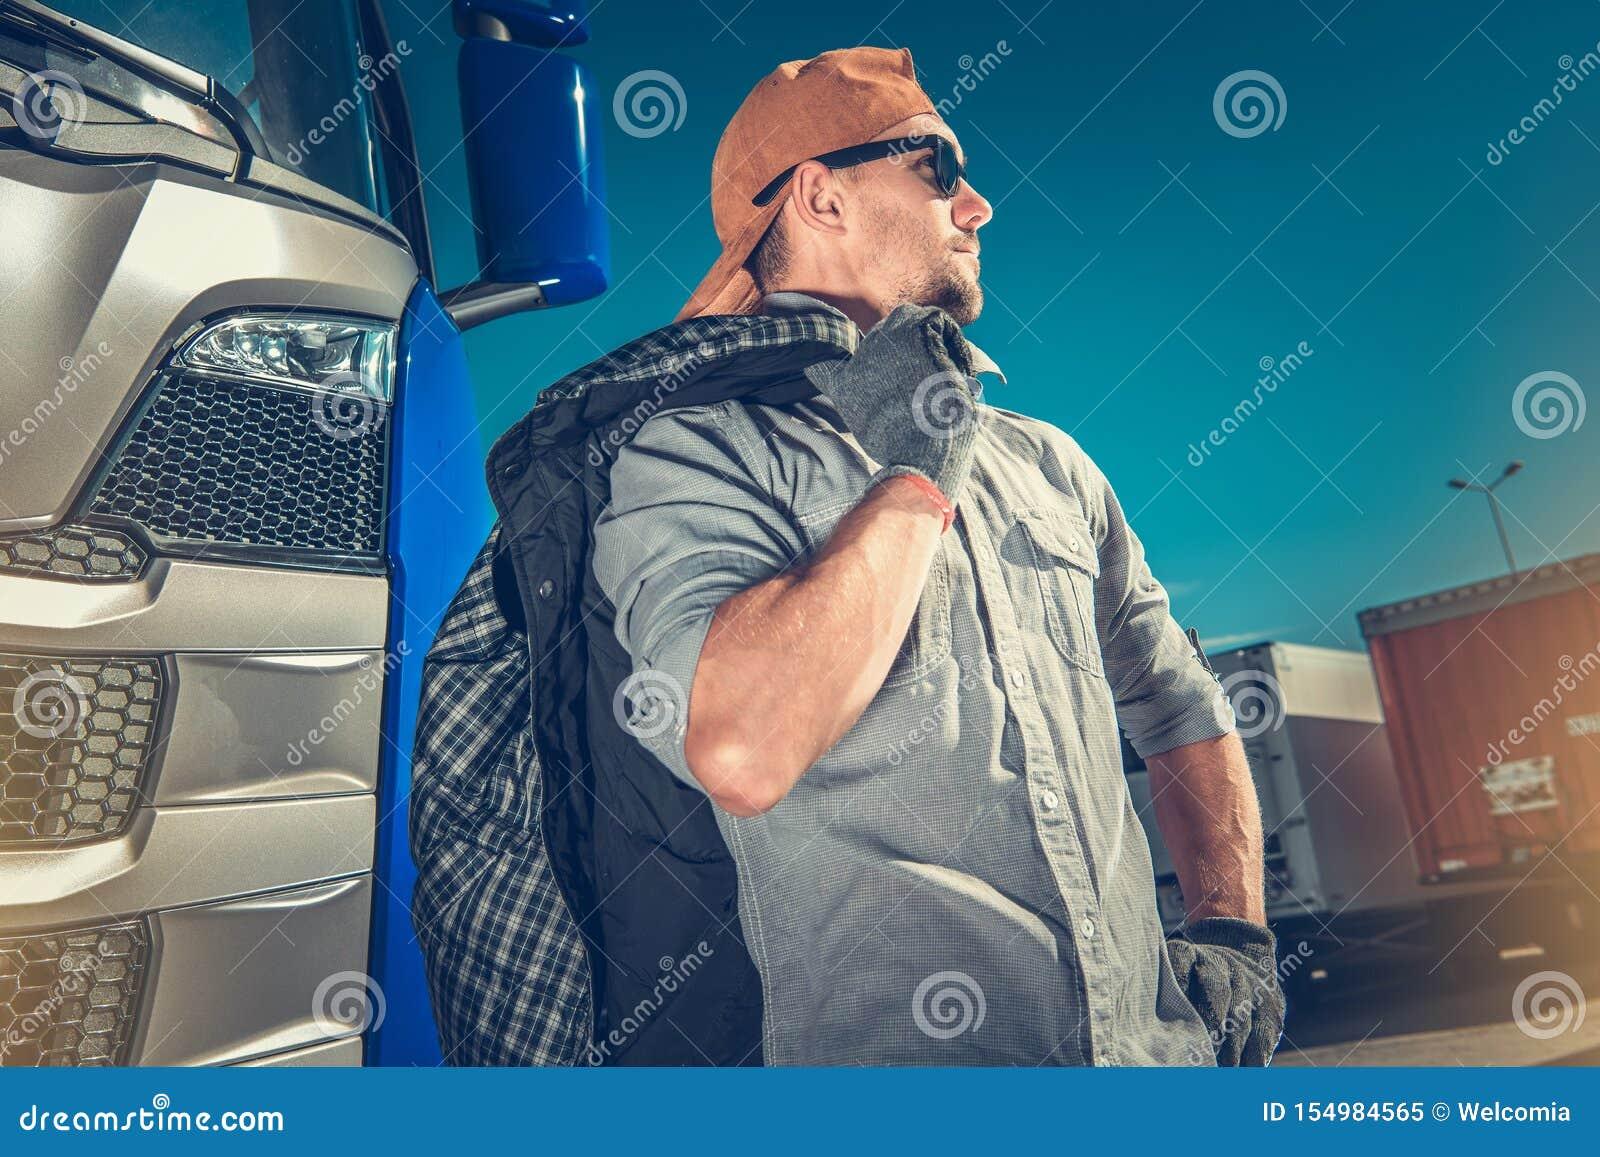 Professional Truck Driver